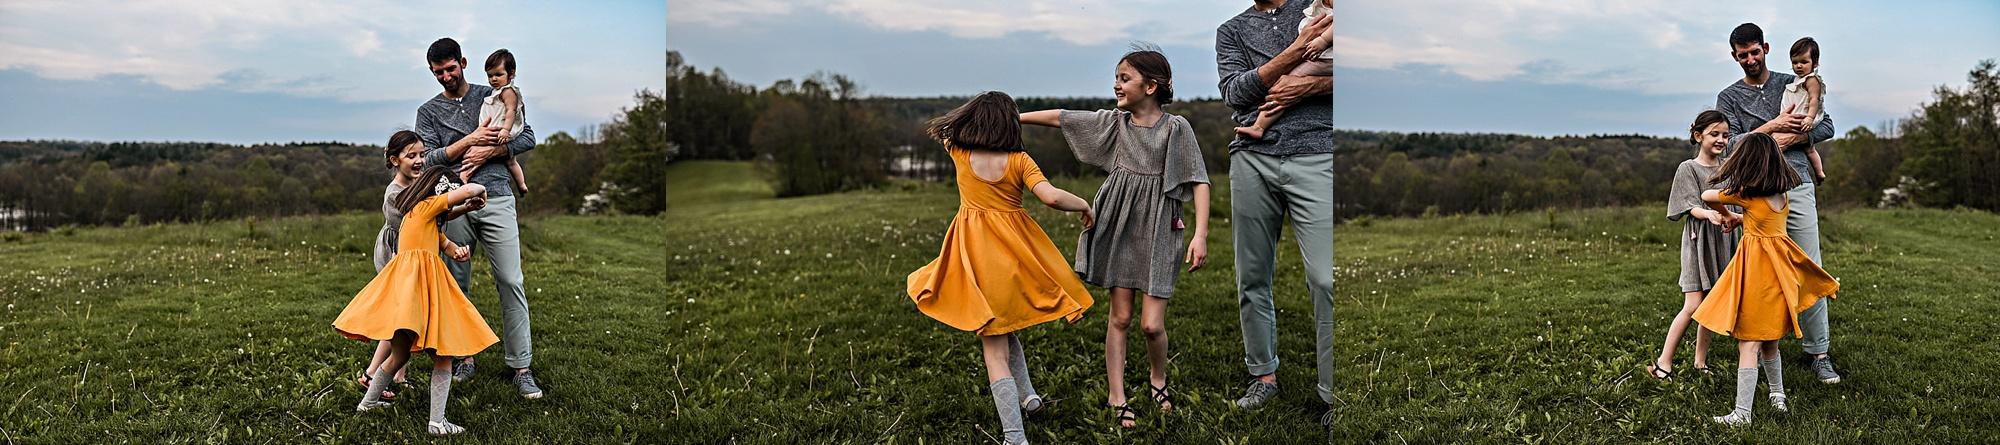 lauren-grayson-akron-ohio-family-photographer-molly_0031.jpg